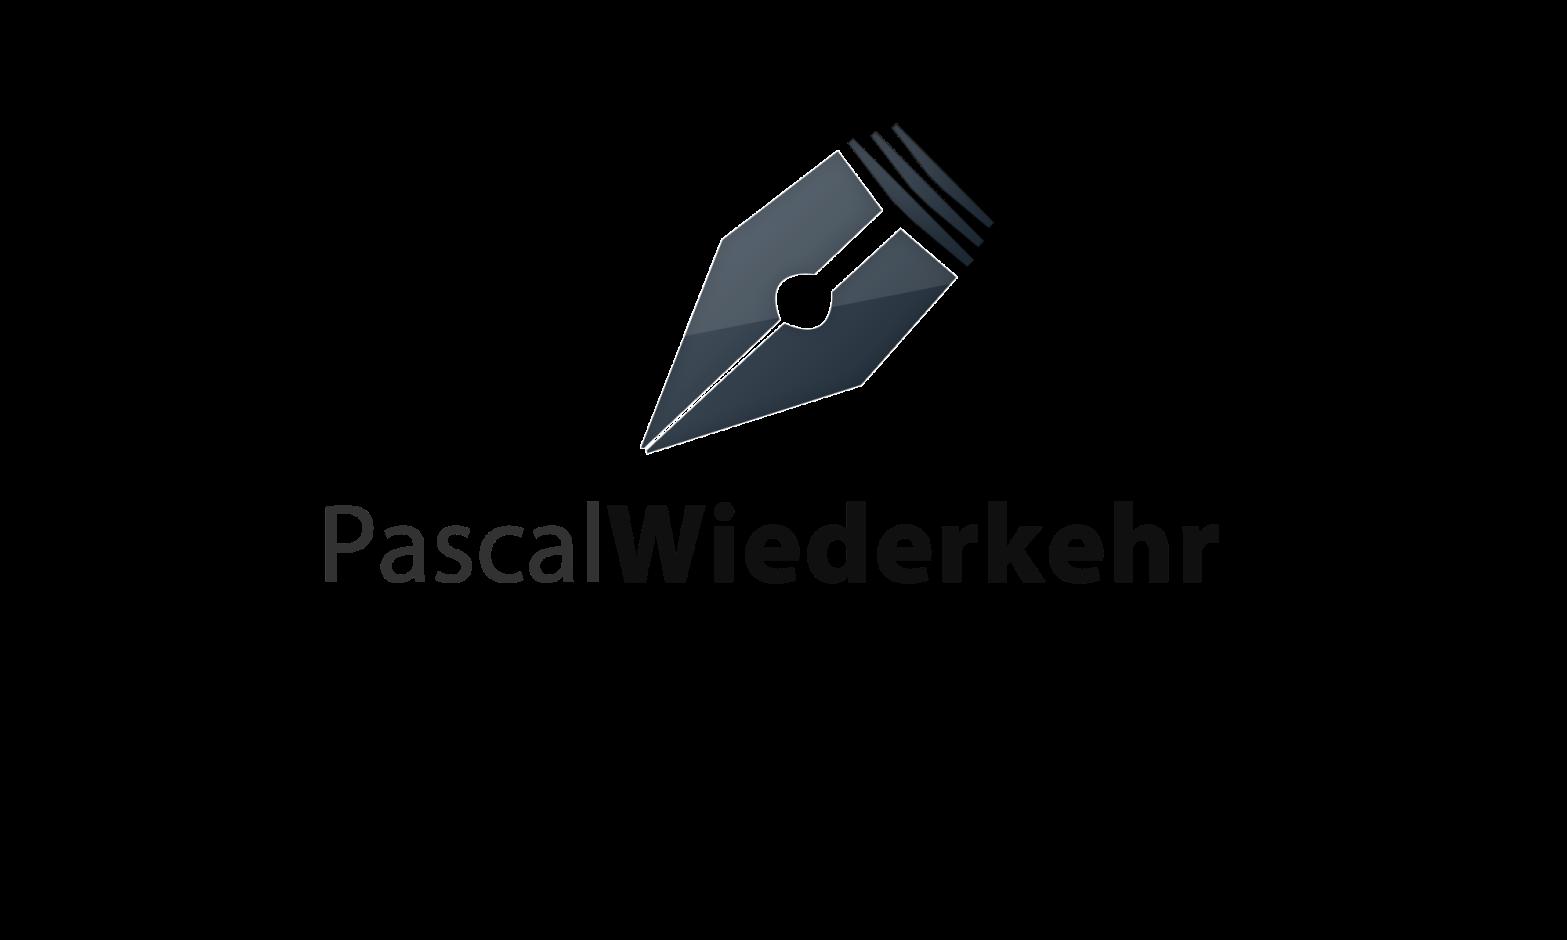 Logo Pascal Wiederkehr